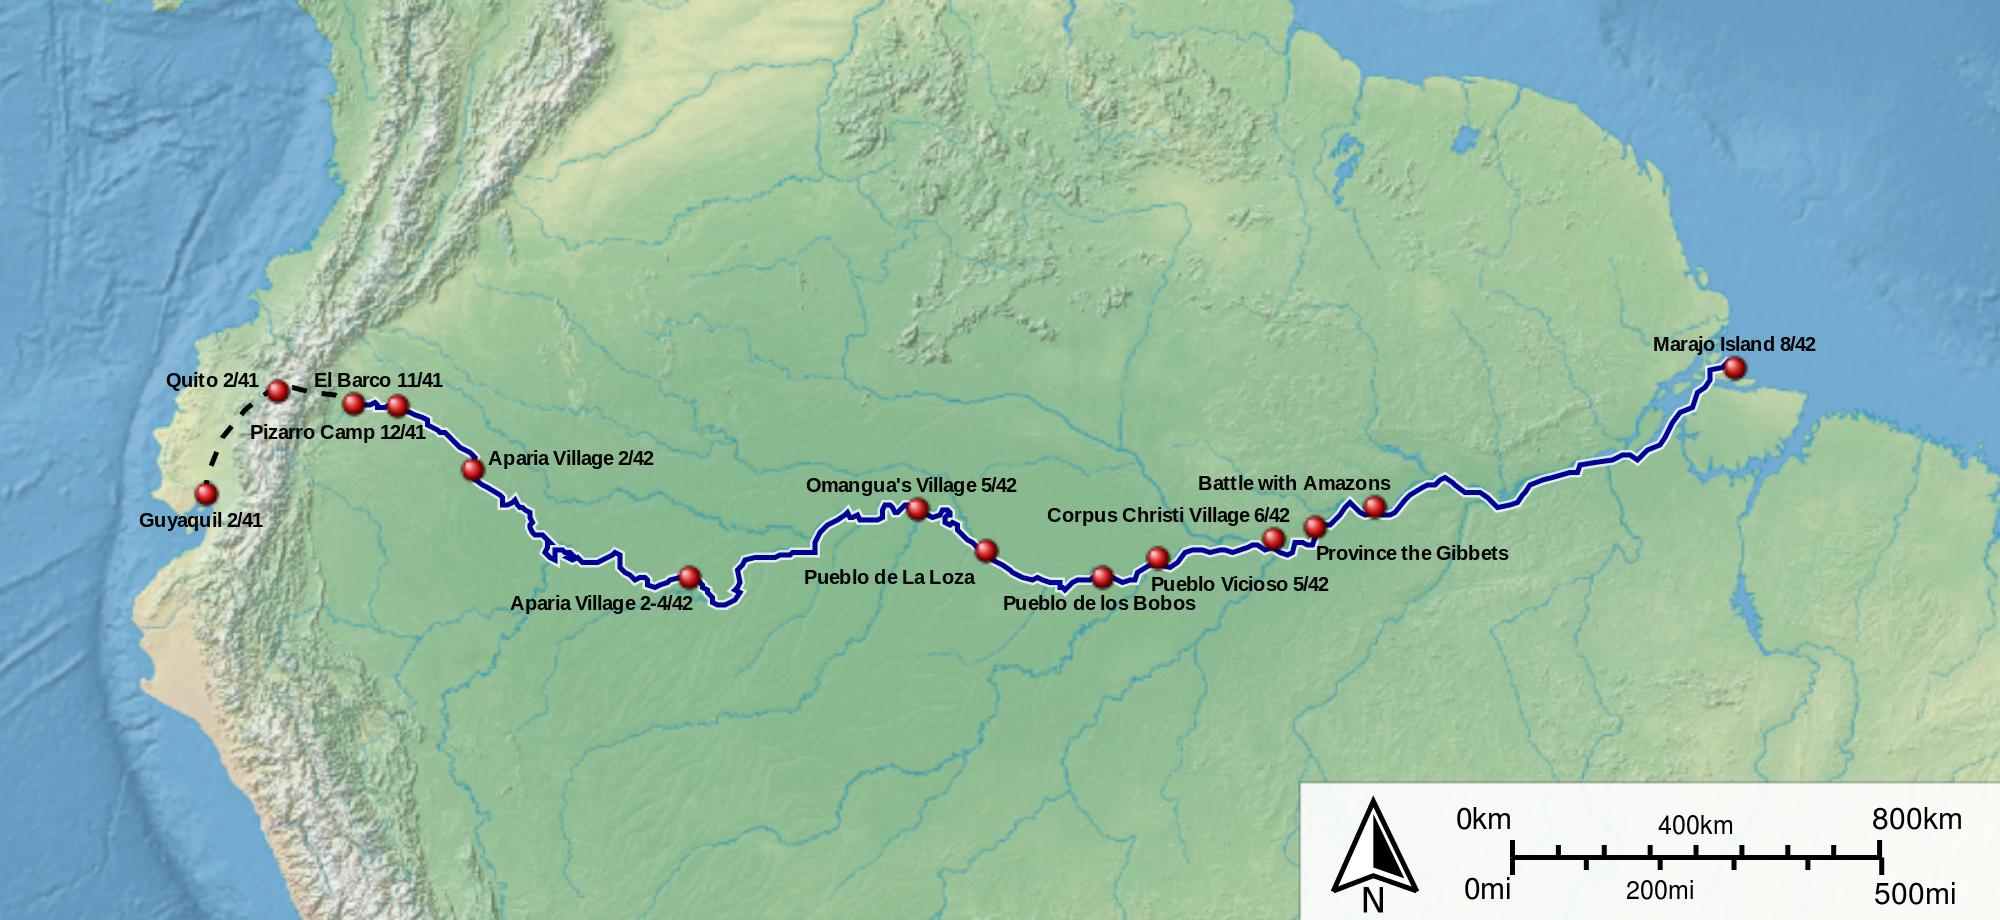 Amazon Rainforest On Emaze - Amazon river map of south america